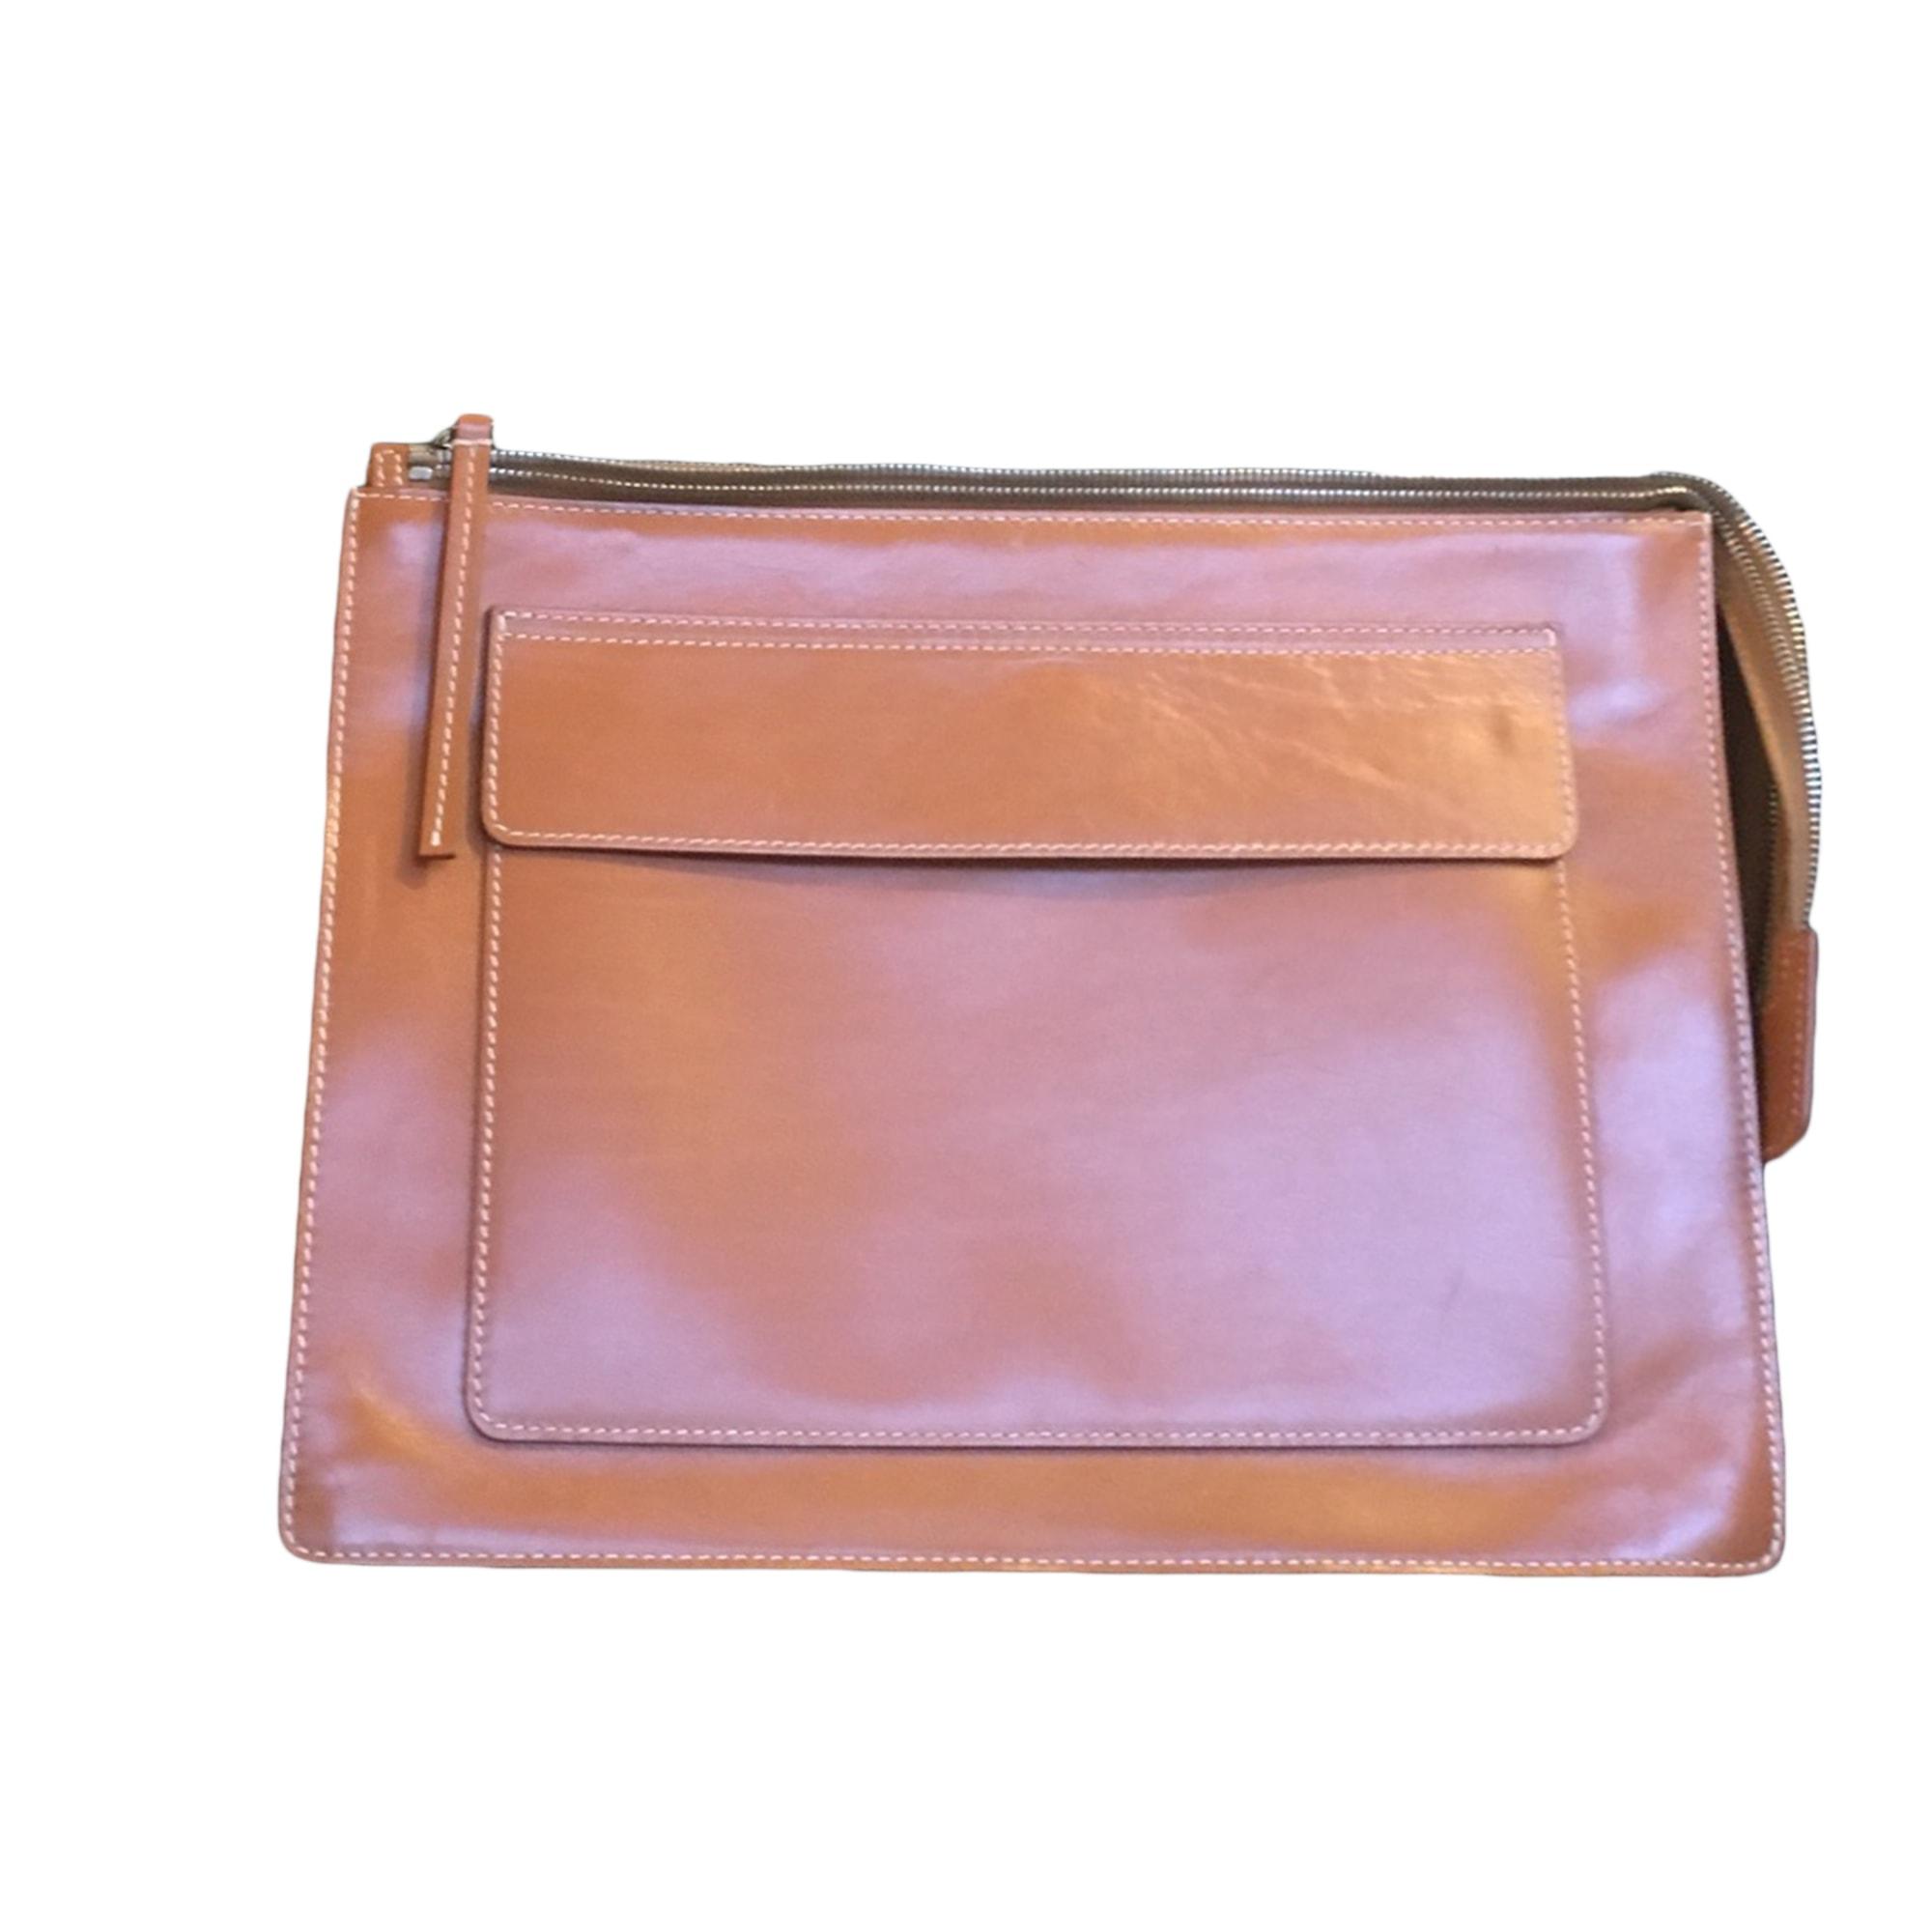 Pochette ACNE cuir marron